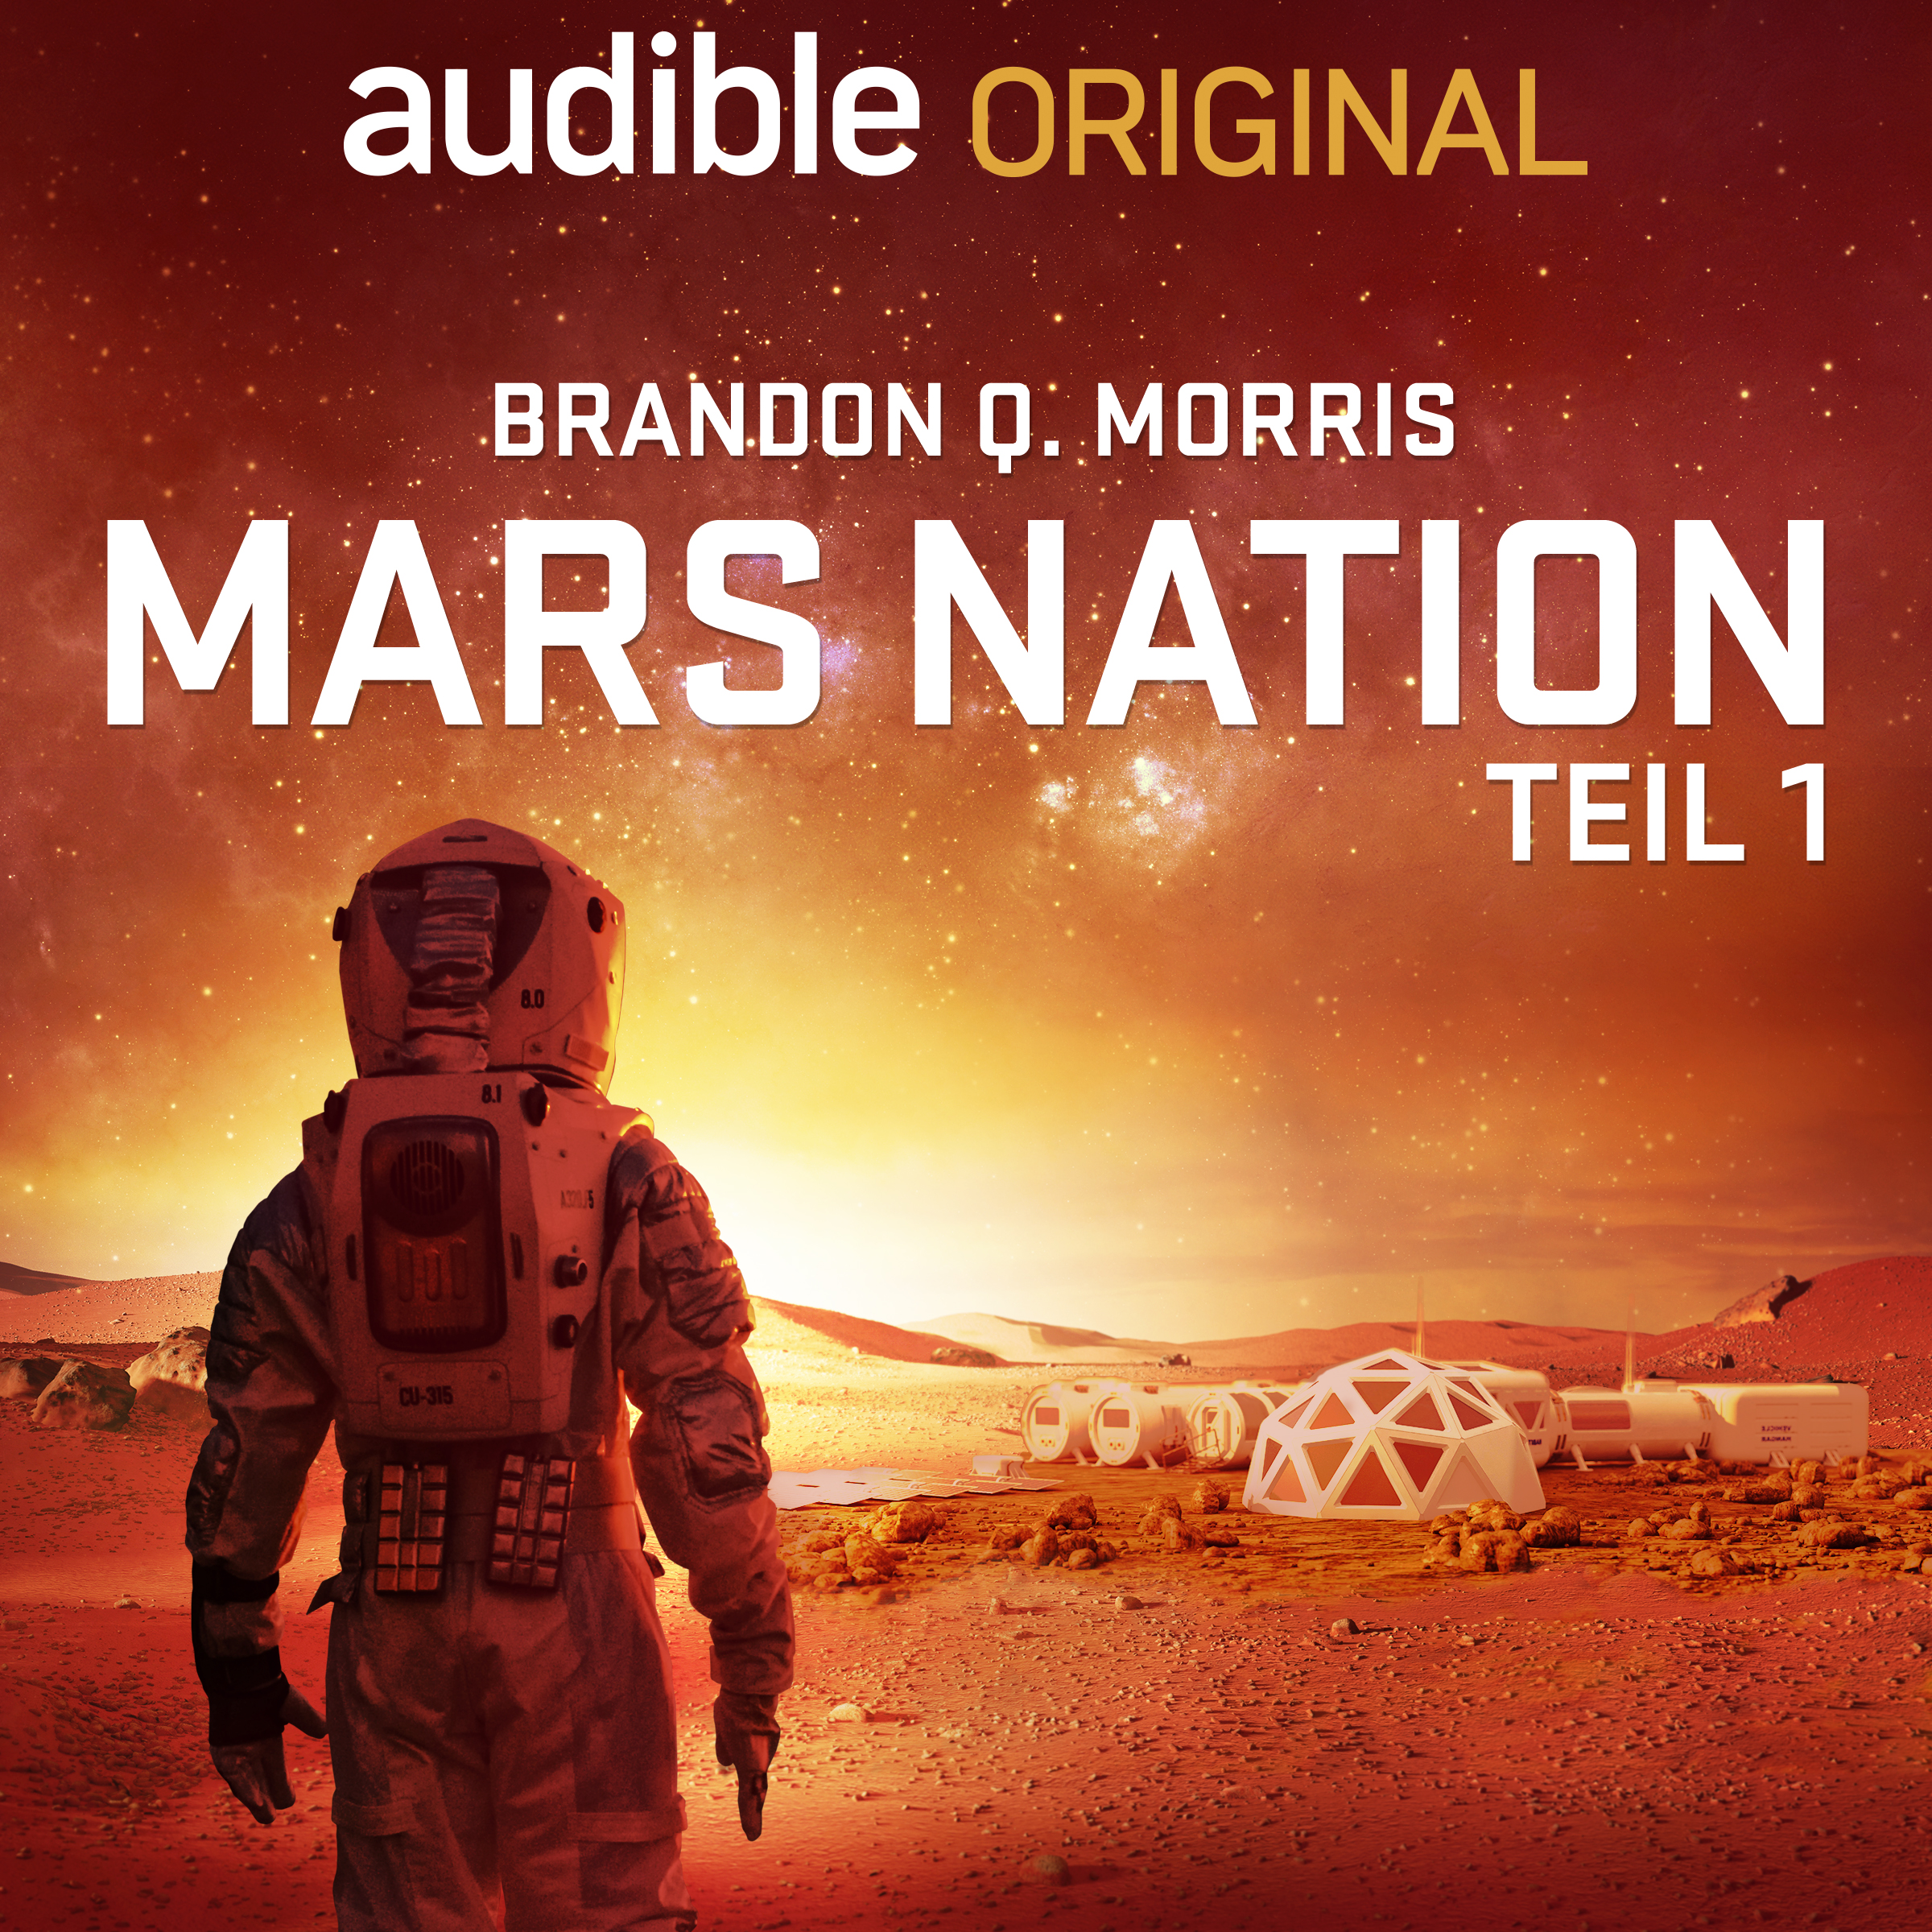 Mars-Nation-Teil-1_Brandon-Q-Morris_Phantastik-Autoren-Netzwerk.jpg